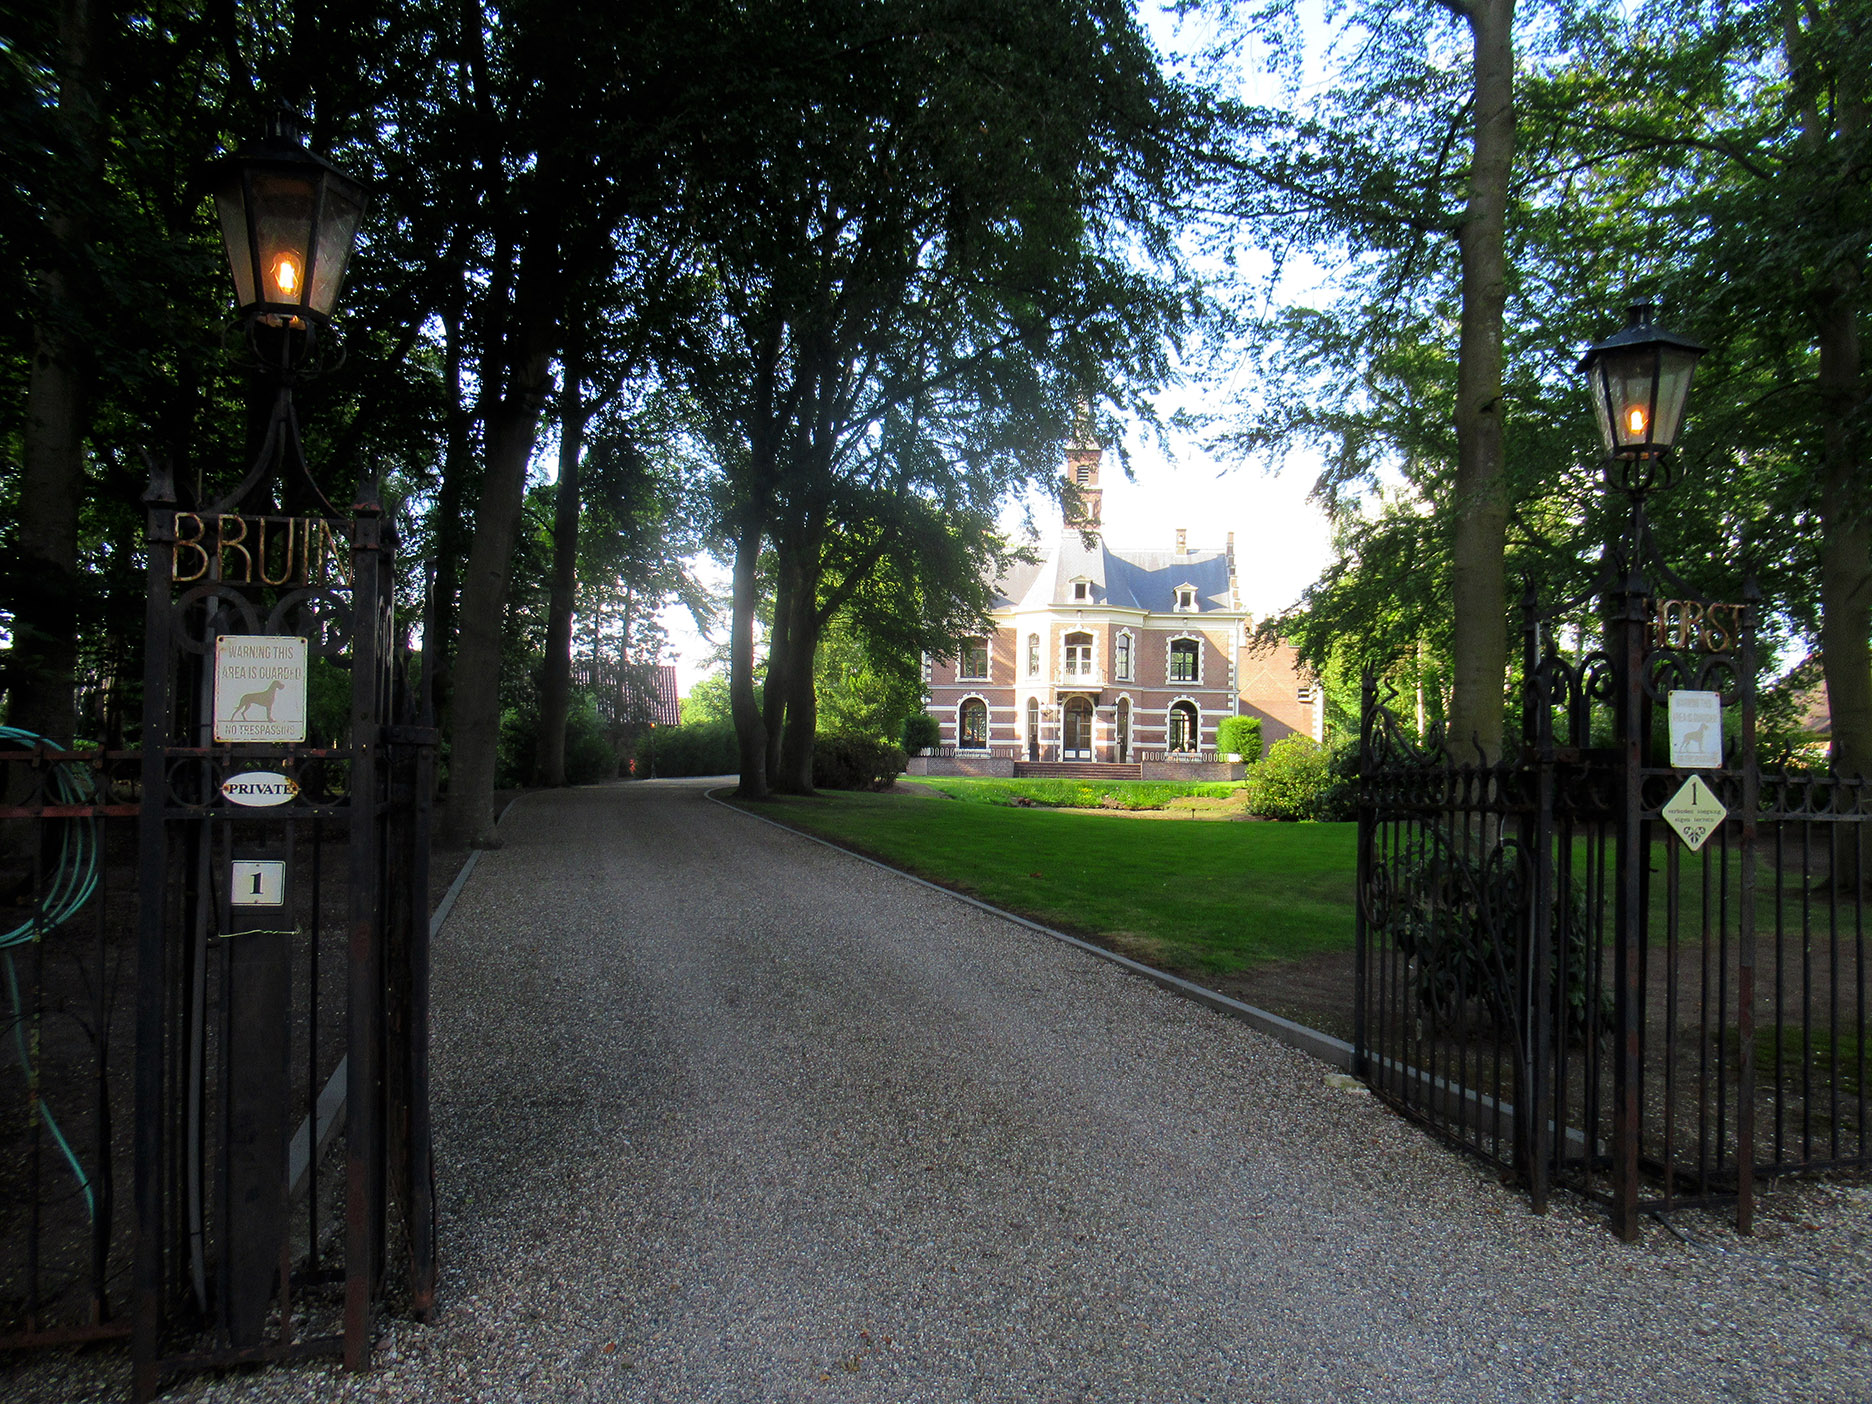 Het toegangshek naar kasteel Bruinhorst in Ederveen - Foto: ©Louis Fraanje